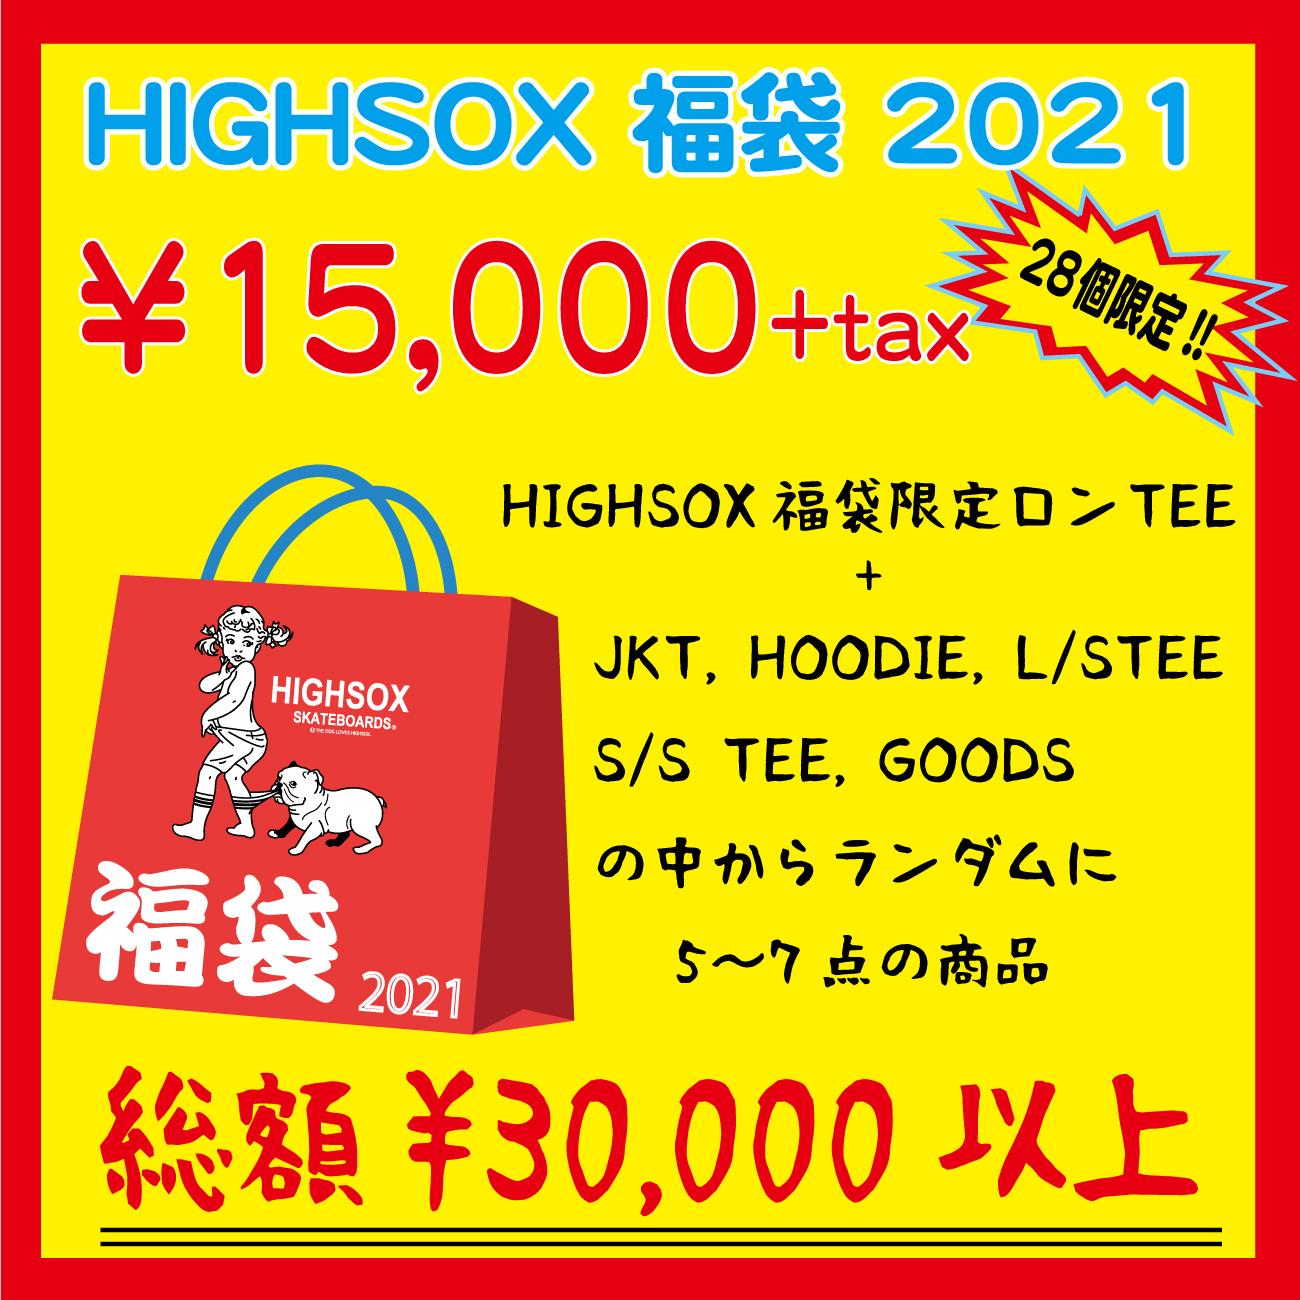 HIGHSOX福袋2021先行発売開始!!